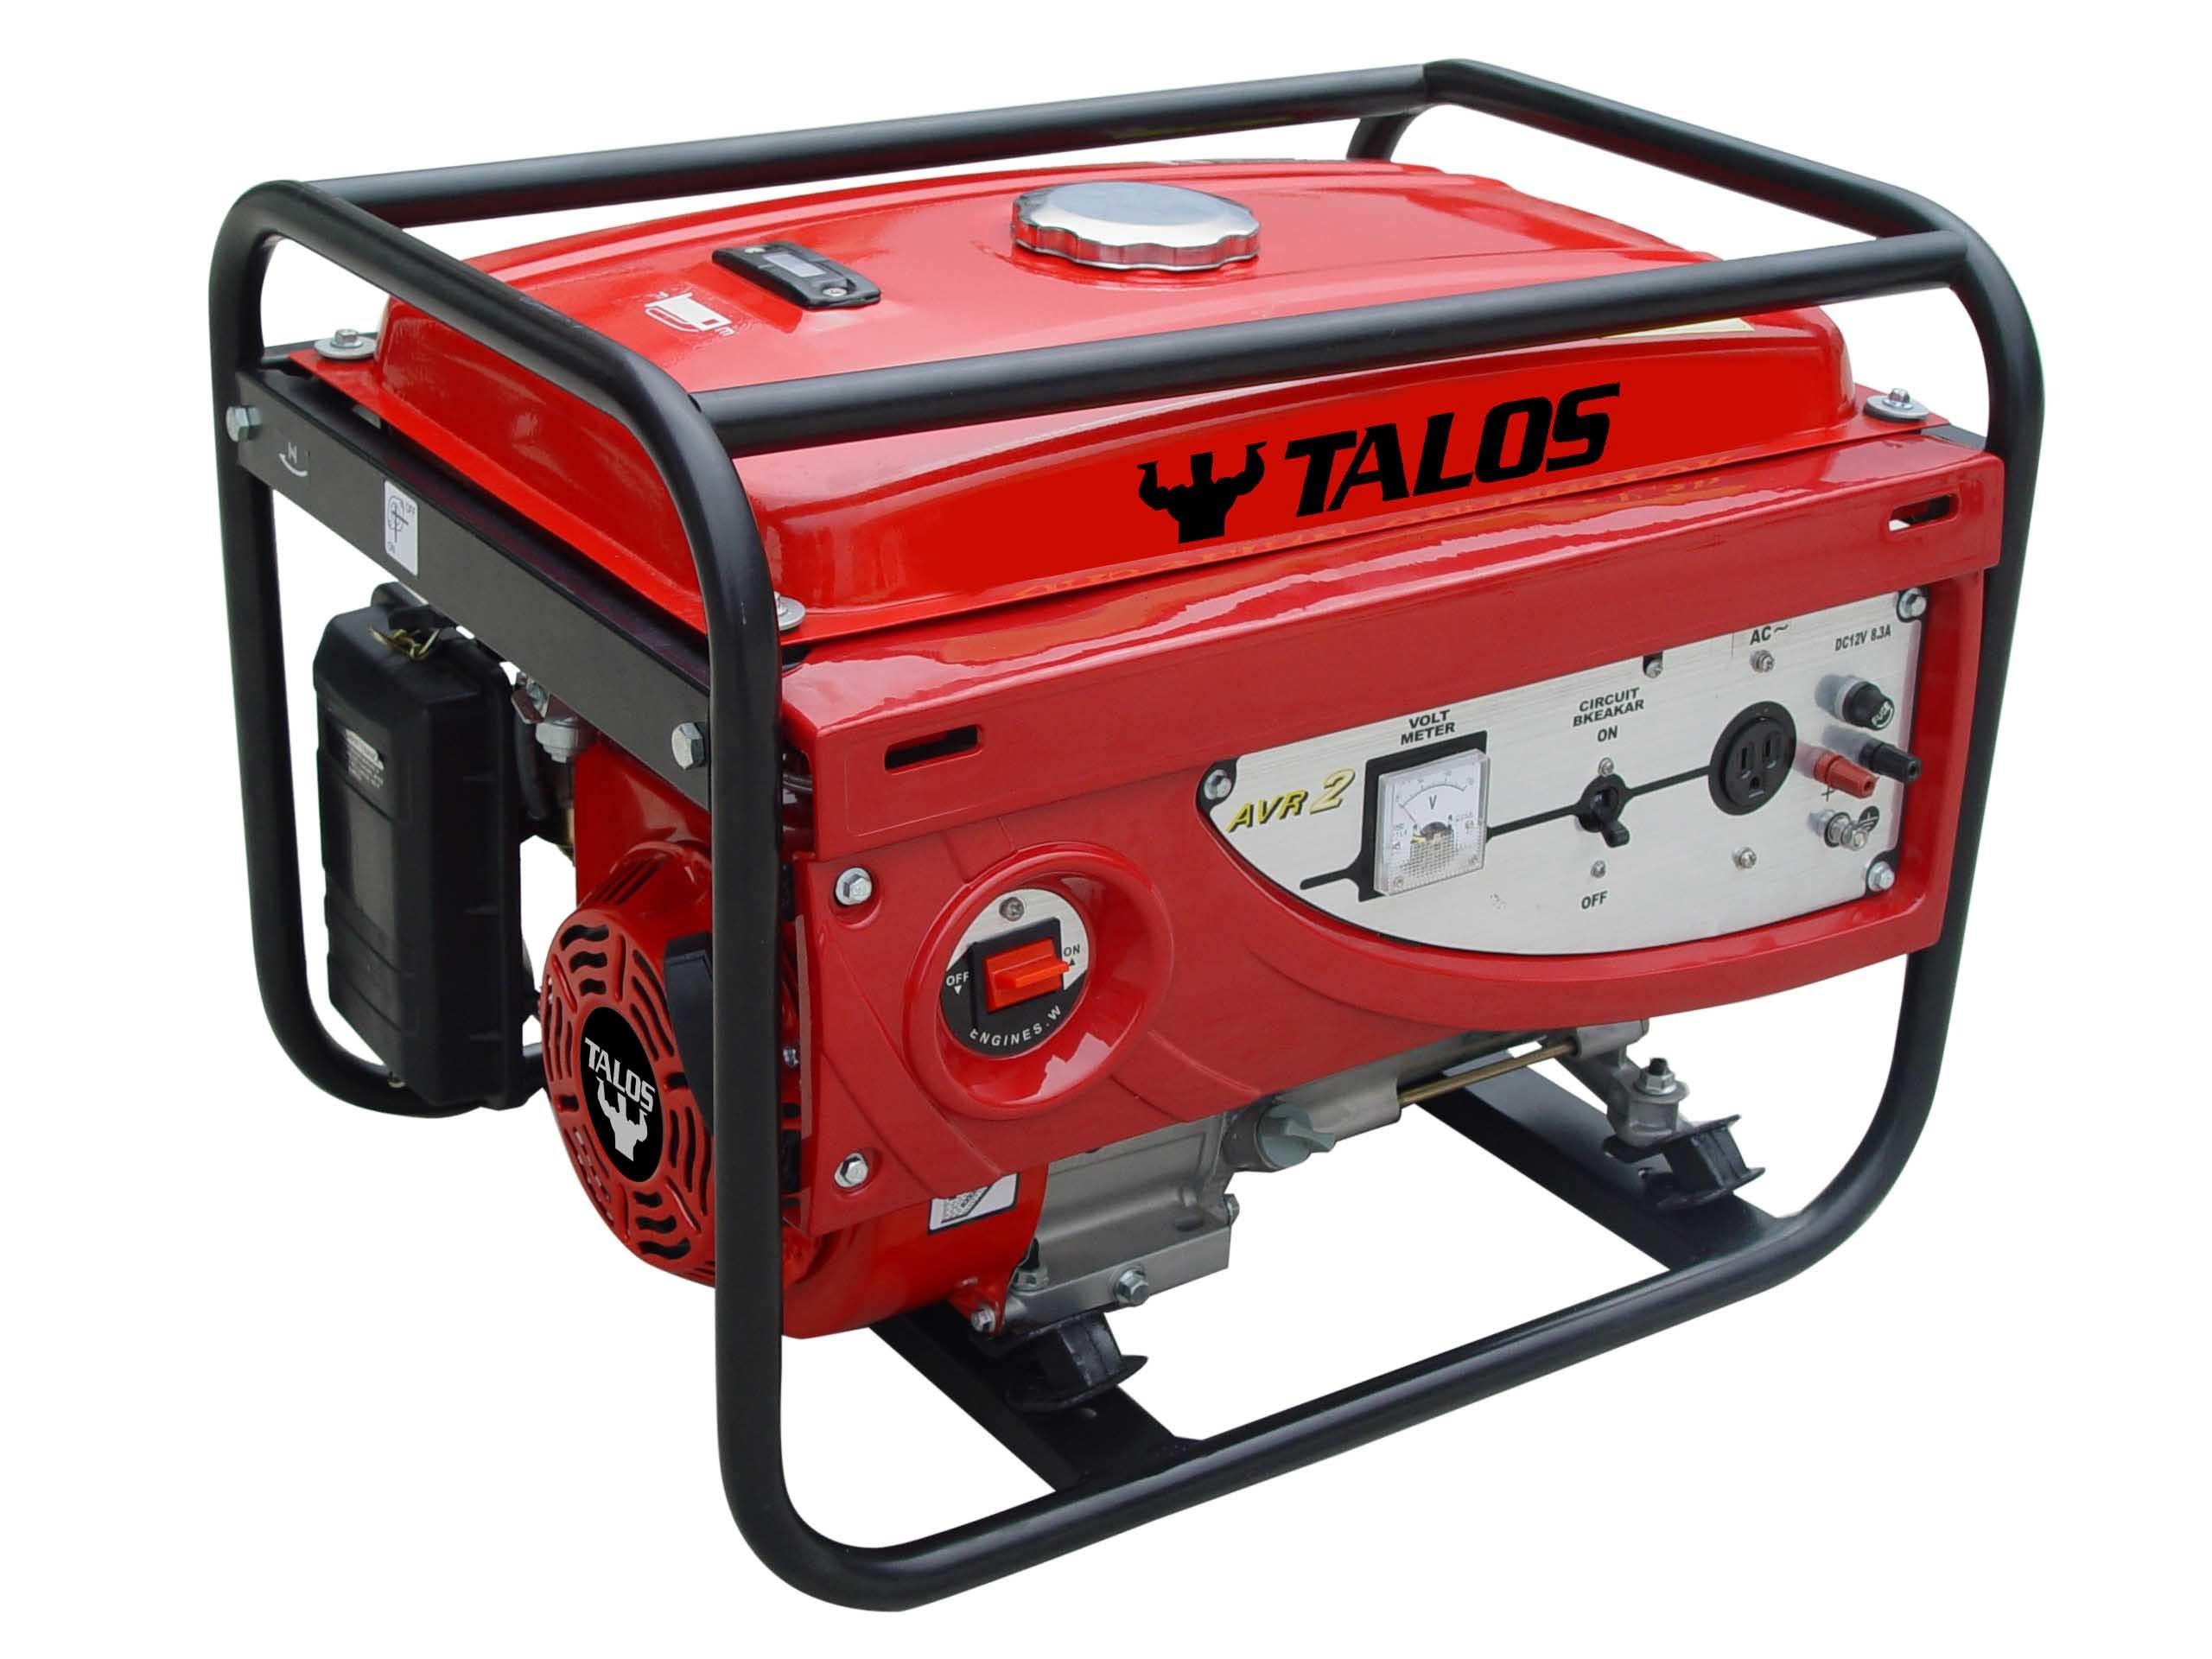 China 7 kVA Portable Gasoline Generator TG8000 s &